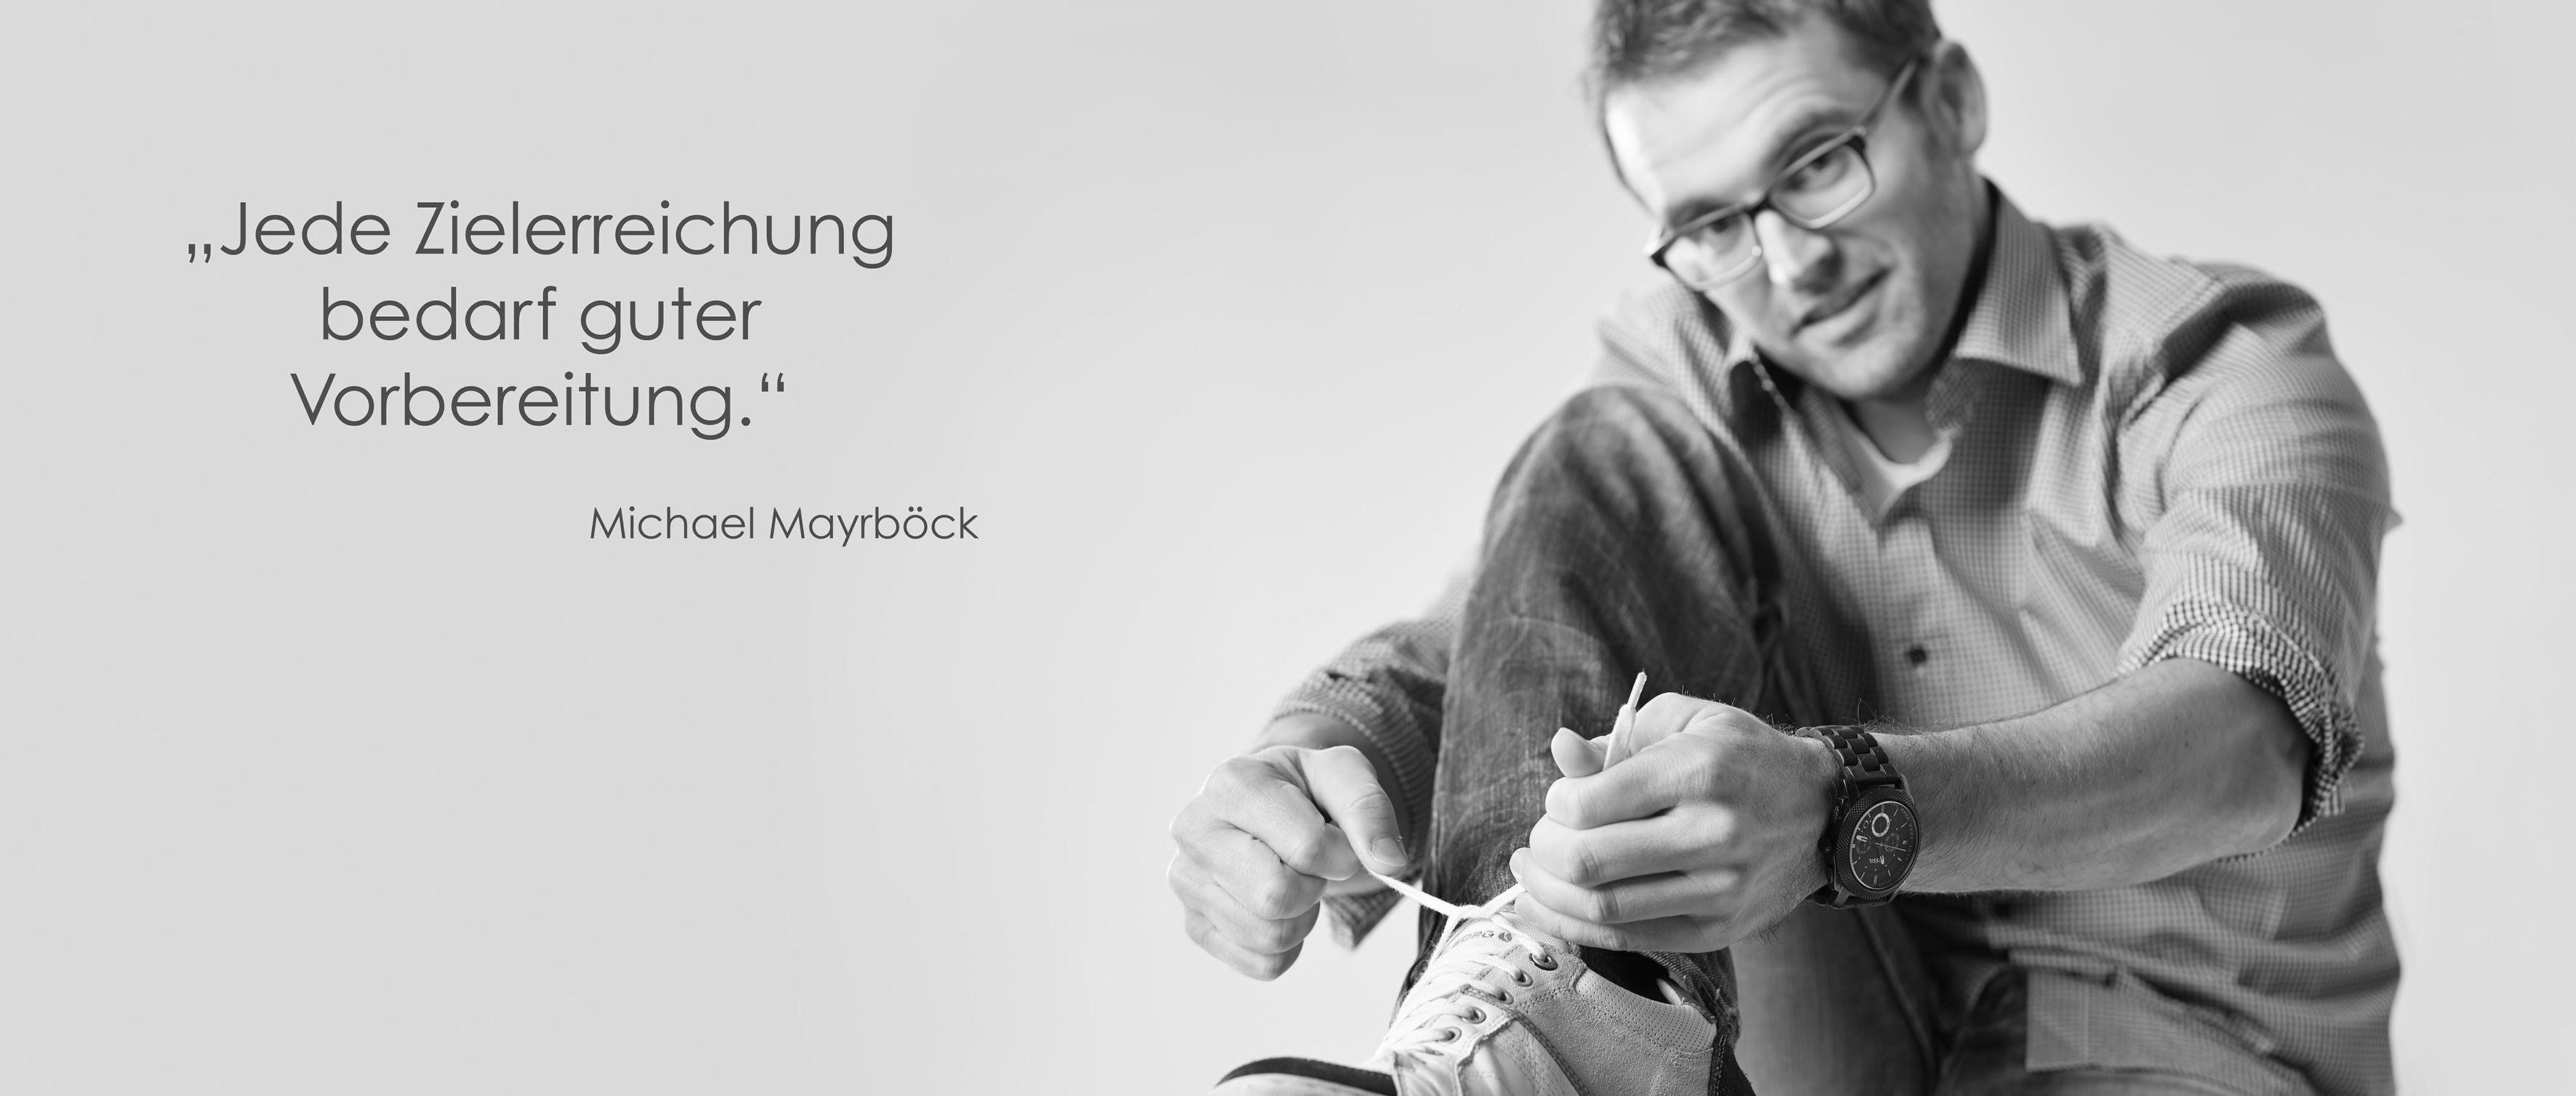 Michael Mayrböck - Personal Branding